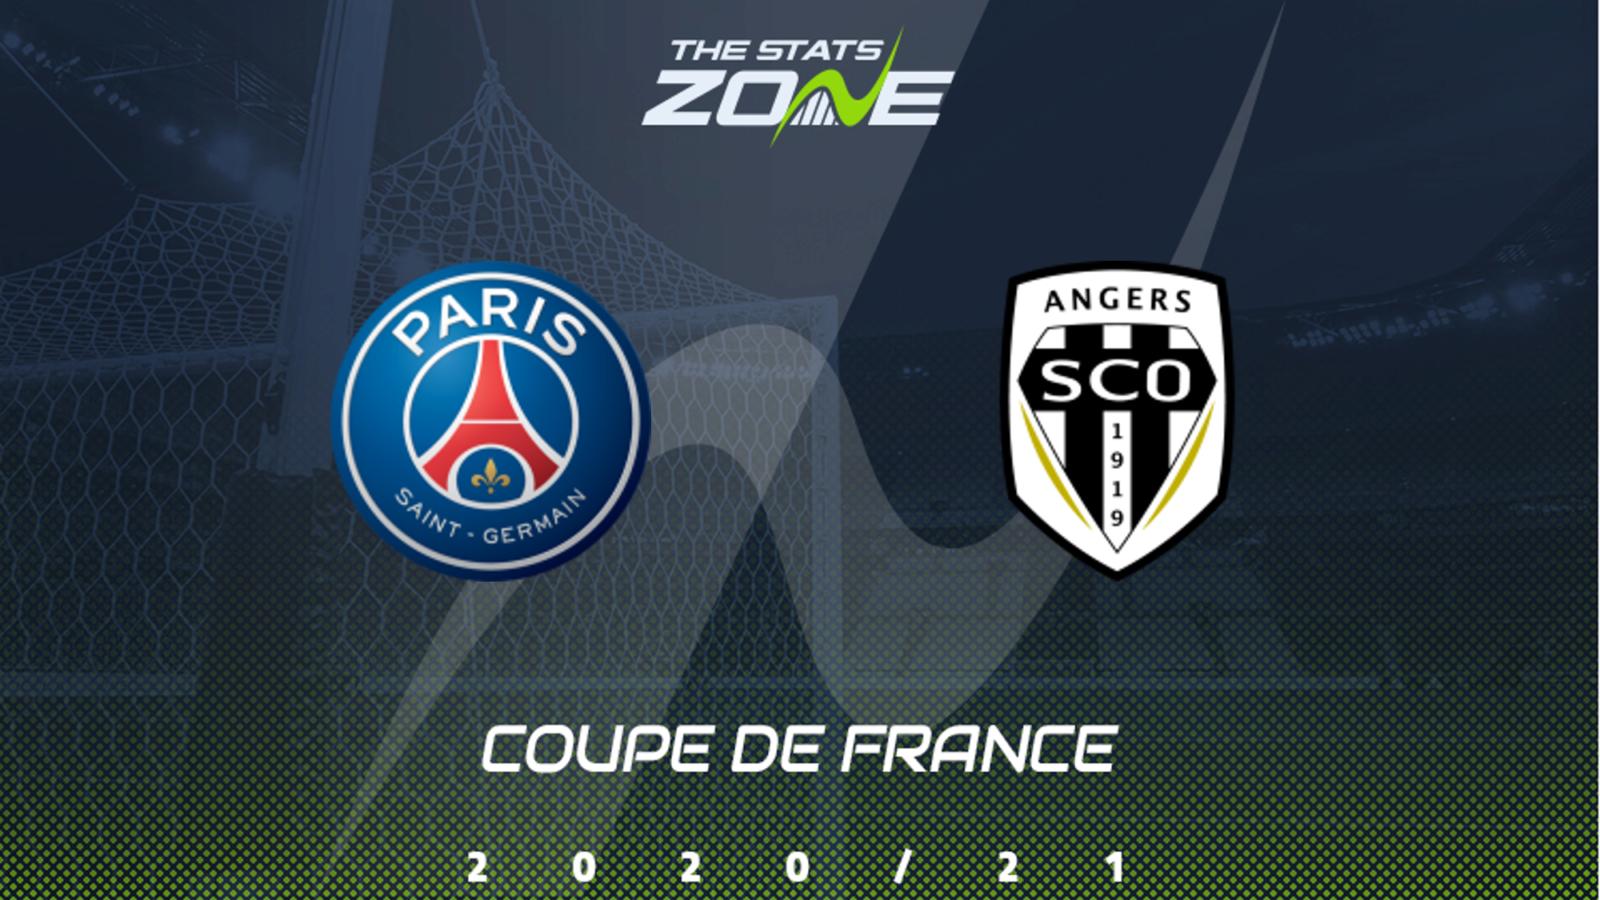 PSG vs Angers Full Match – Coupe De France 2020/21